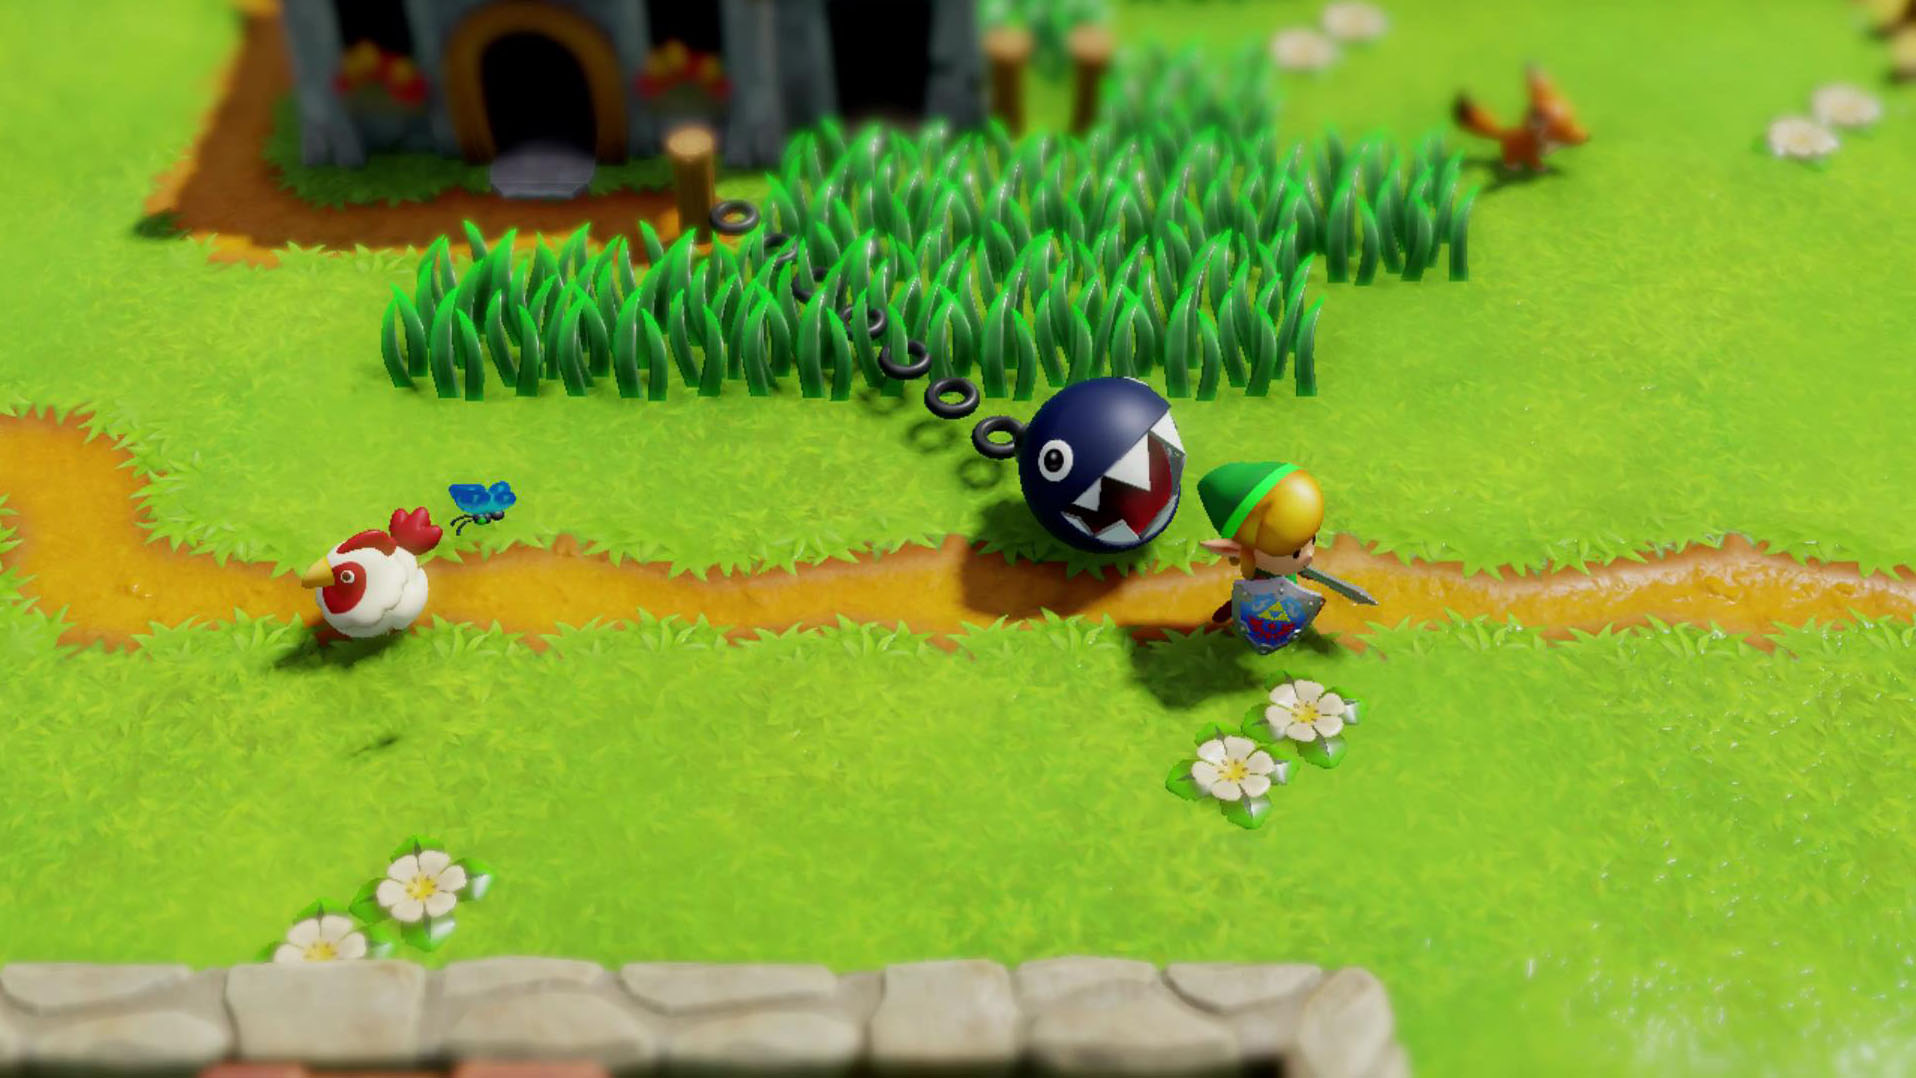 Nintendo says that it's open to more remakes on Switch like Zelda: Link's Awakening screenshot